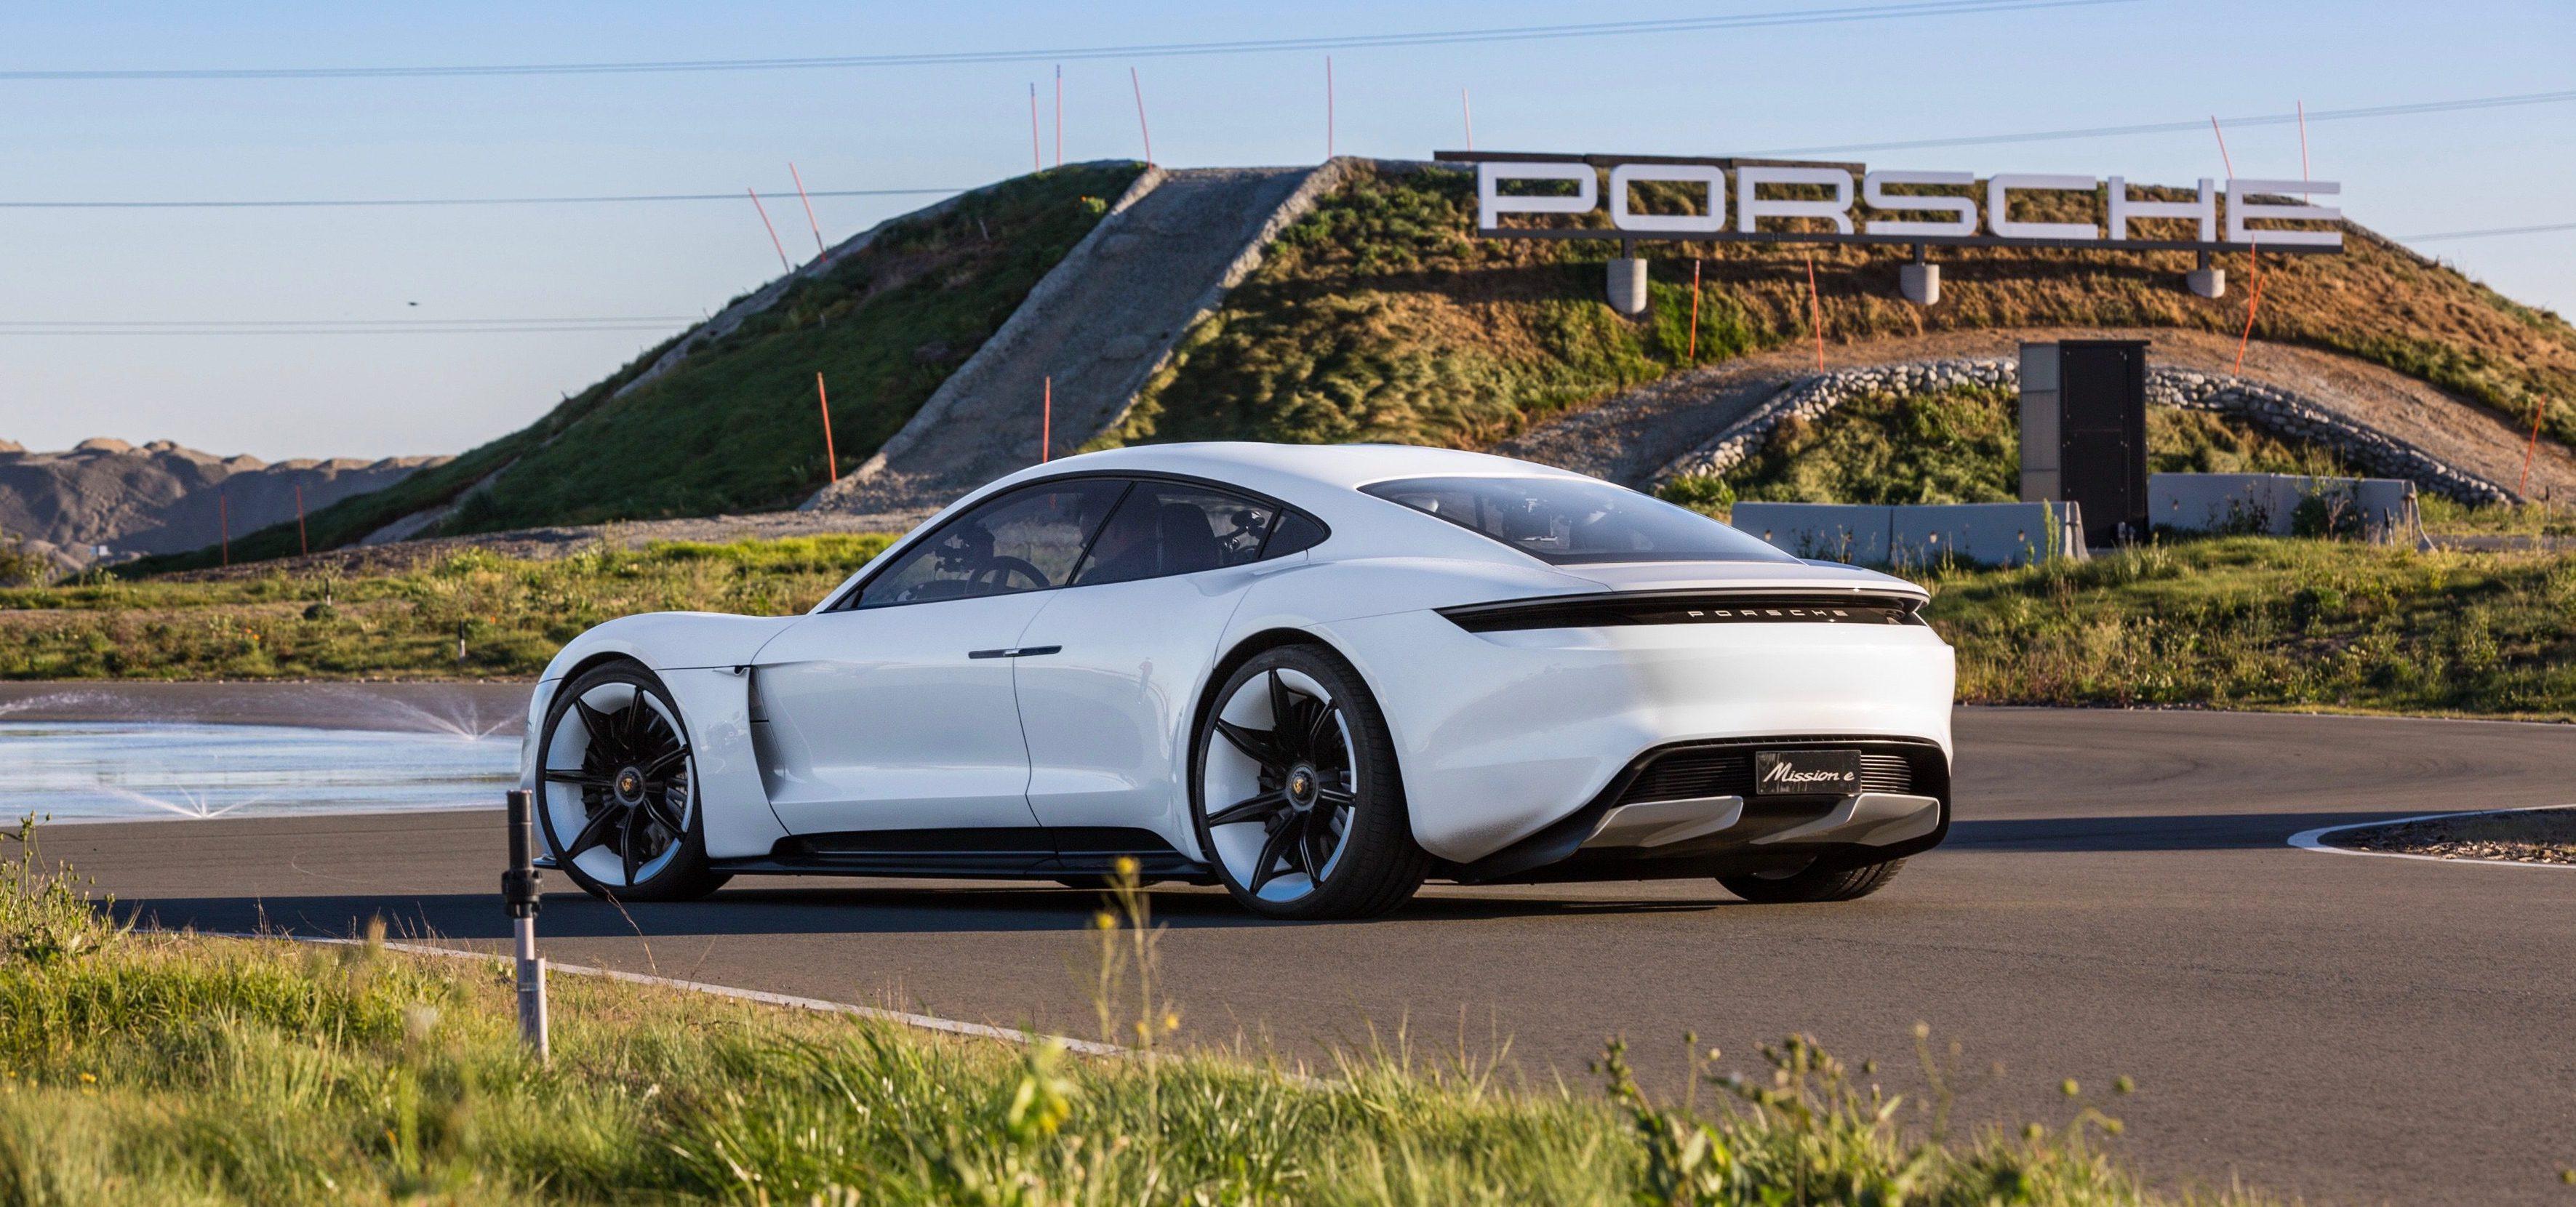 Porsche s Mission E all electric vehicle be es the Taycan Electrek